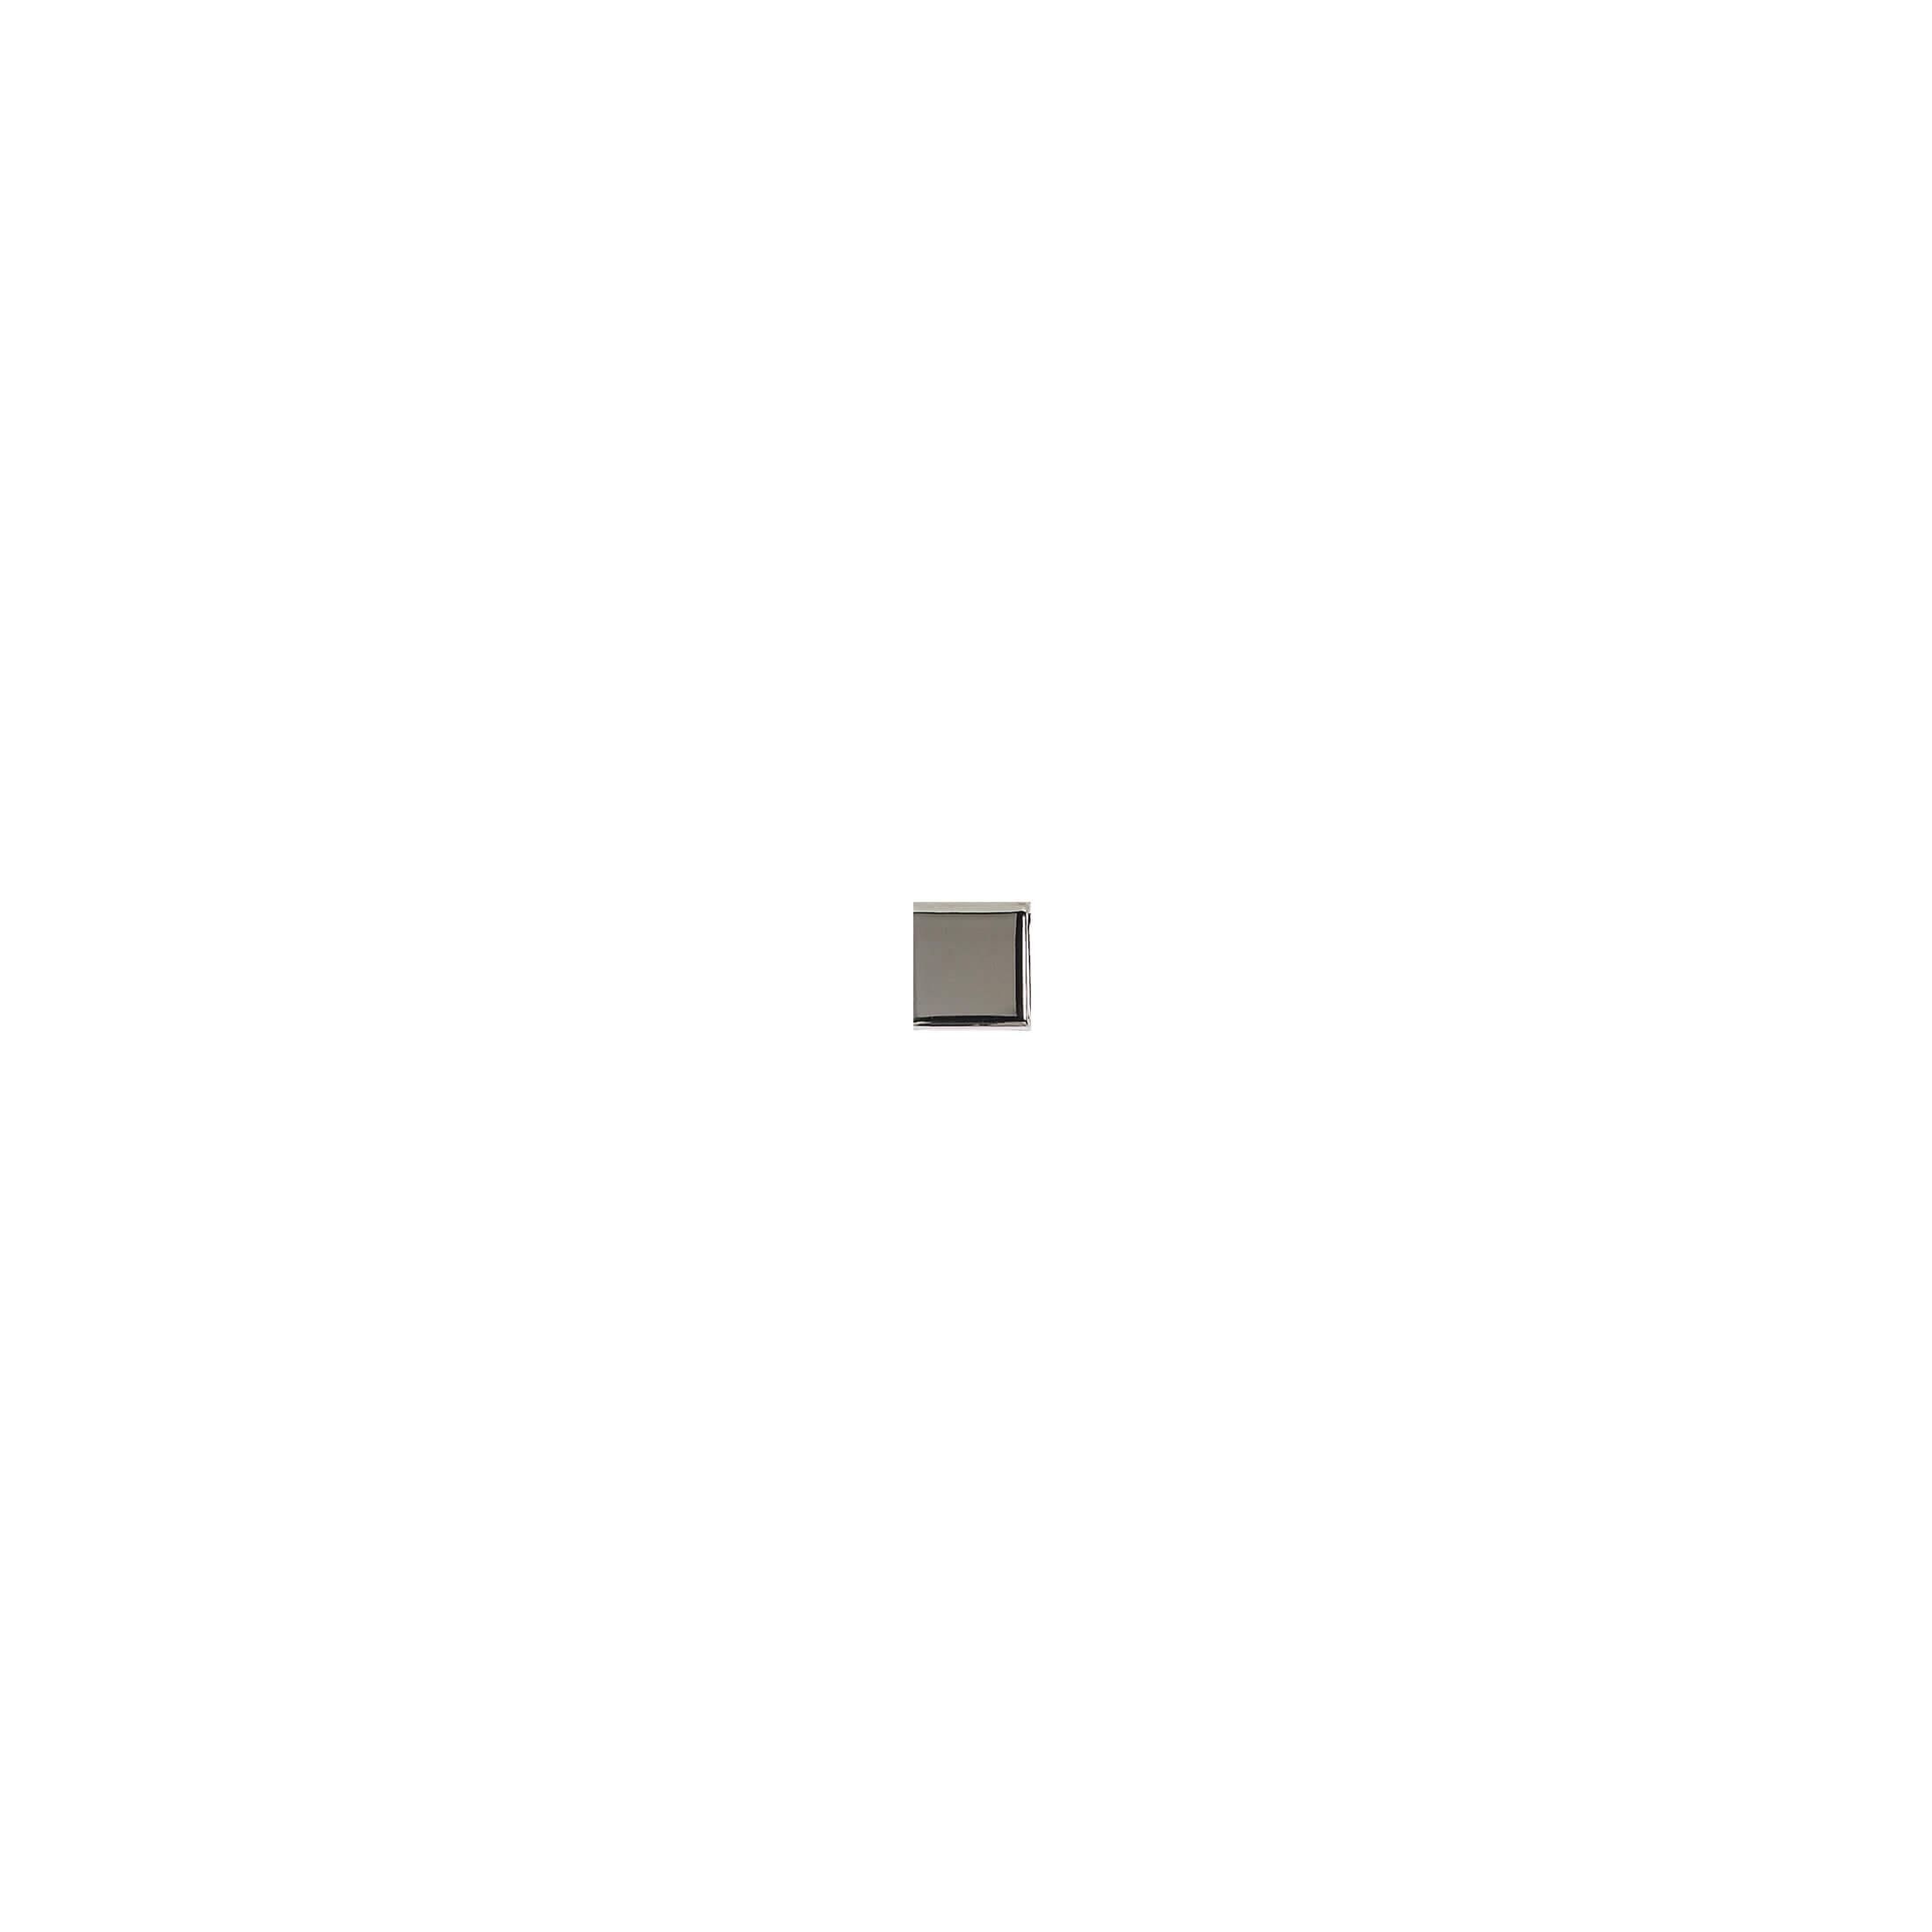 ADNE8061 - TACO PLATA - 2 cm X 2 cm